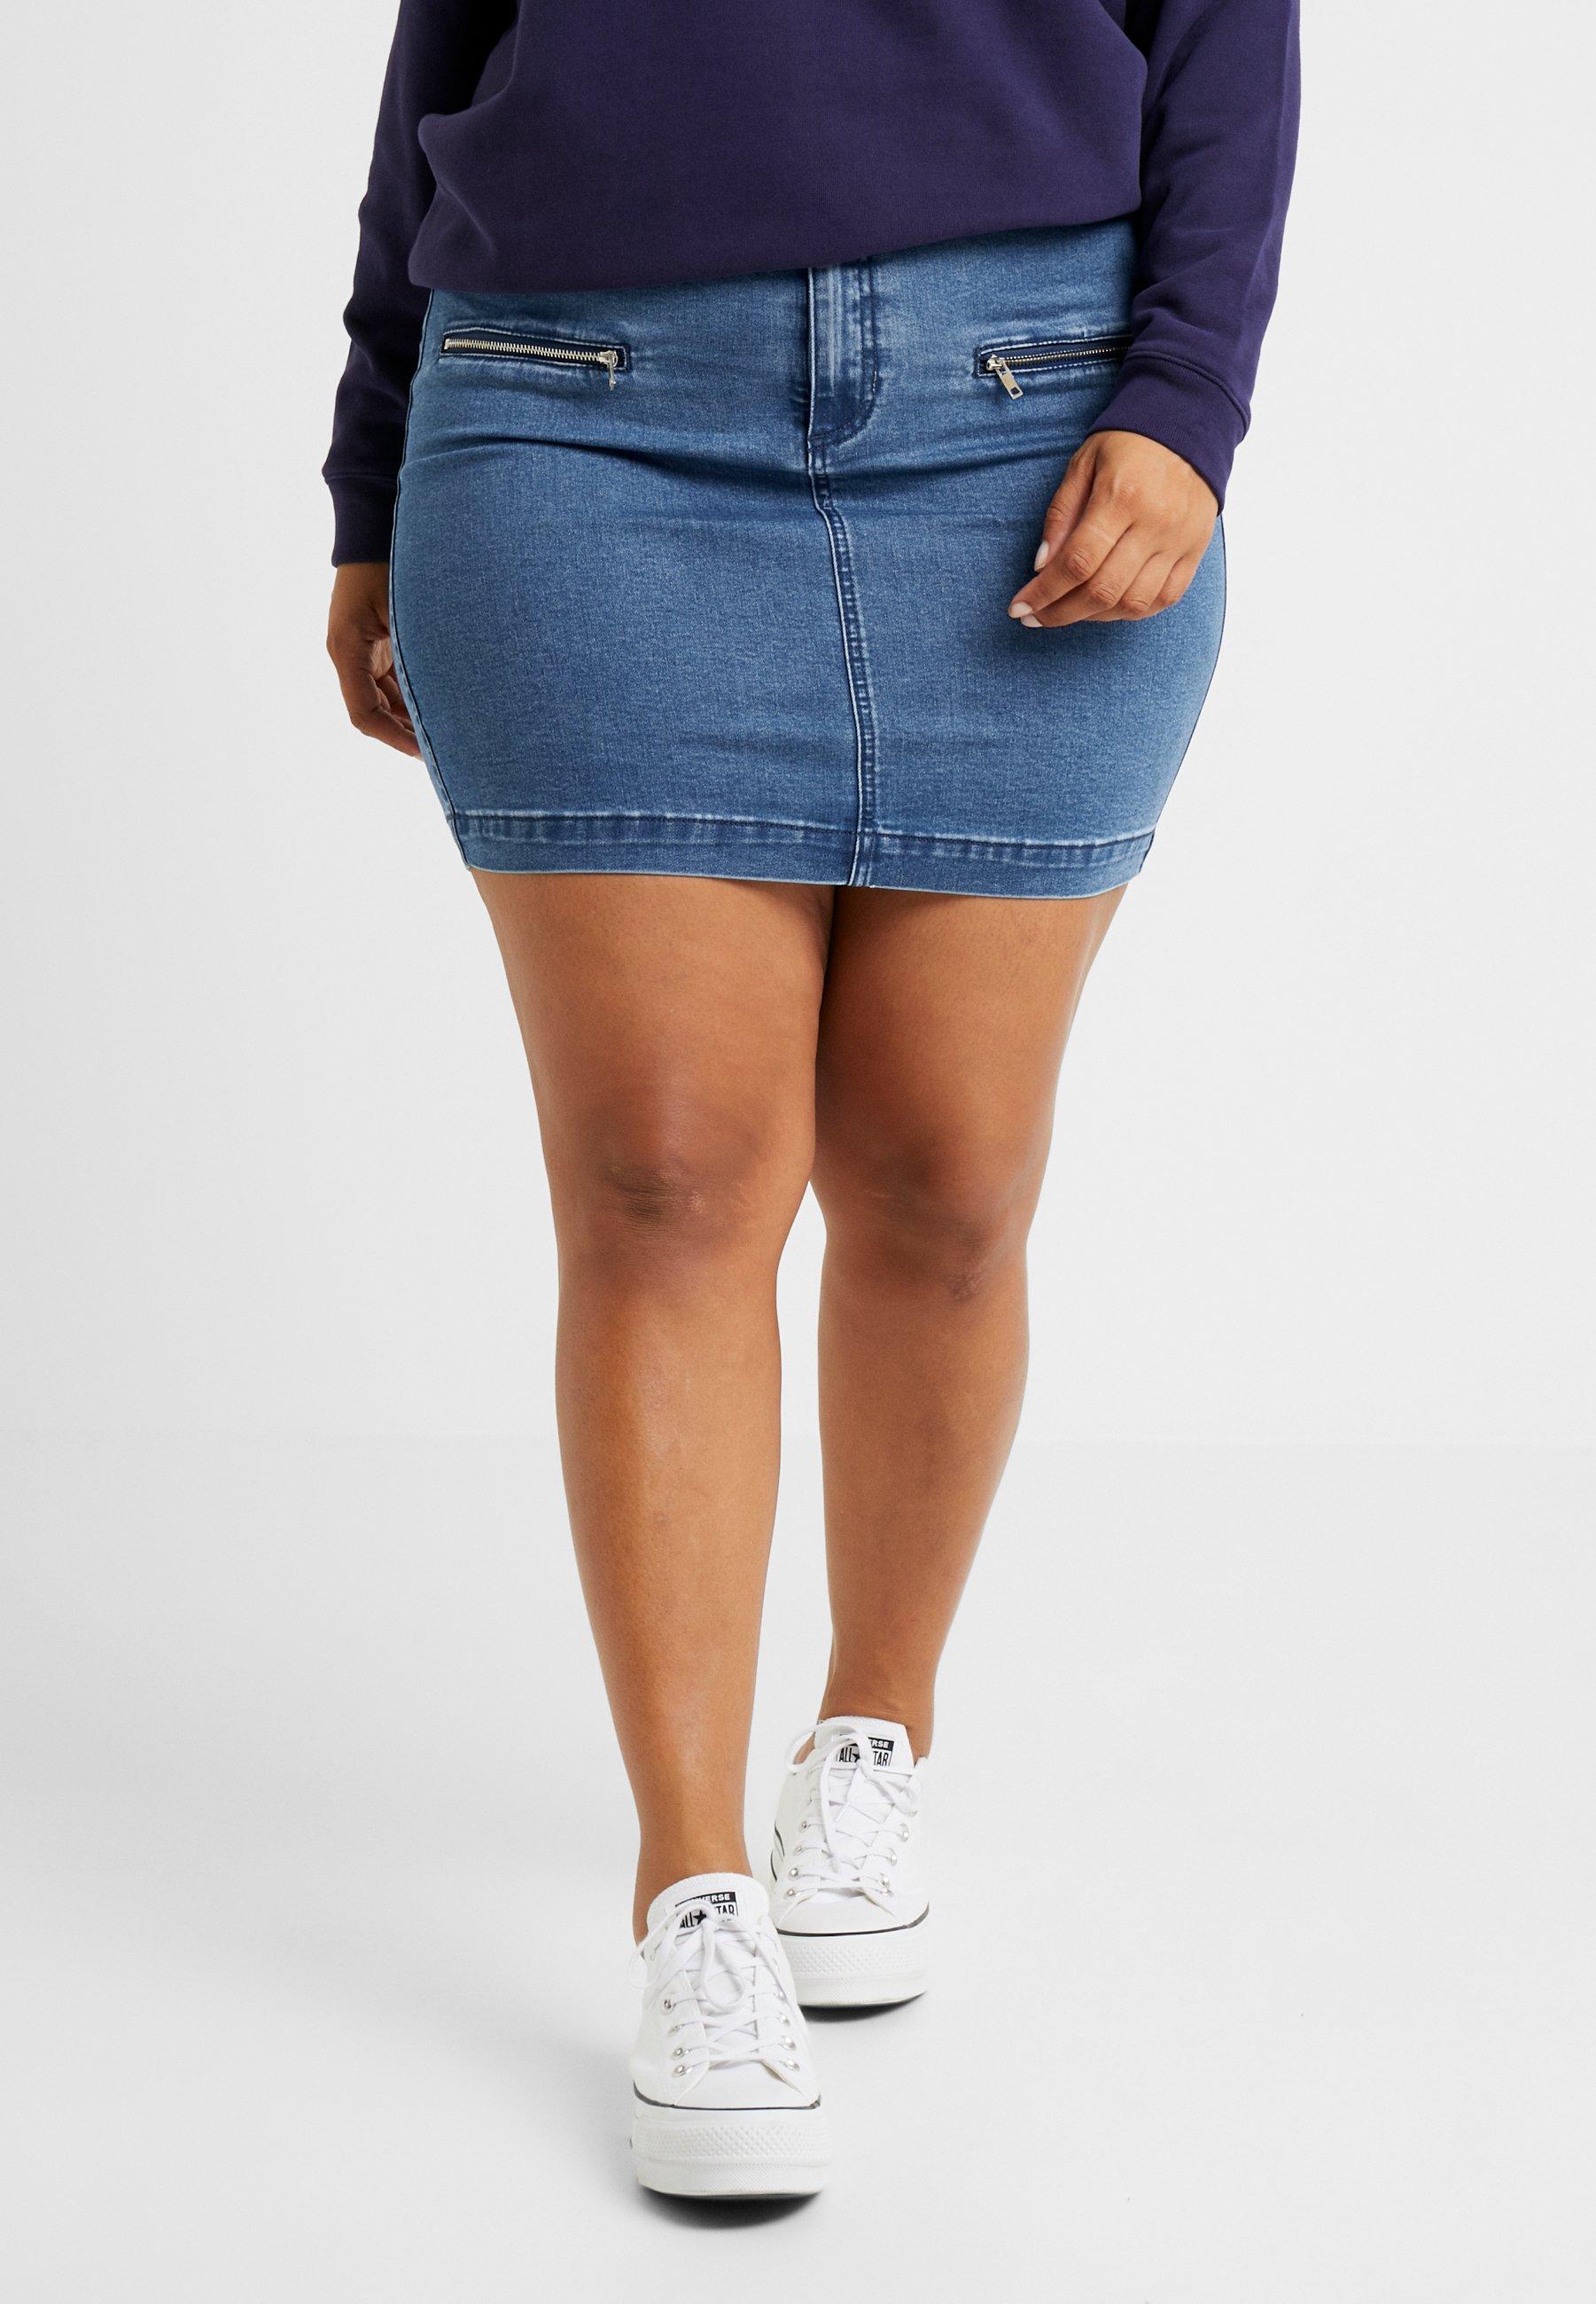 Jean Missguided Blue Zip SkirtJupe En Pocket Mini Plus gYf7yb6